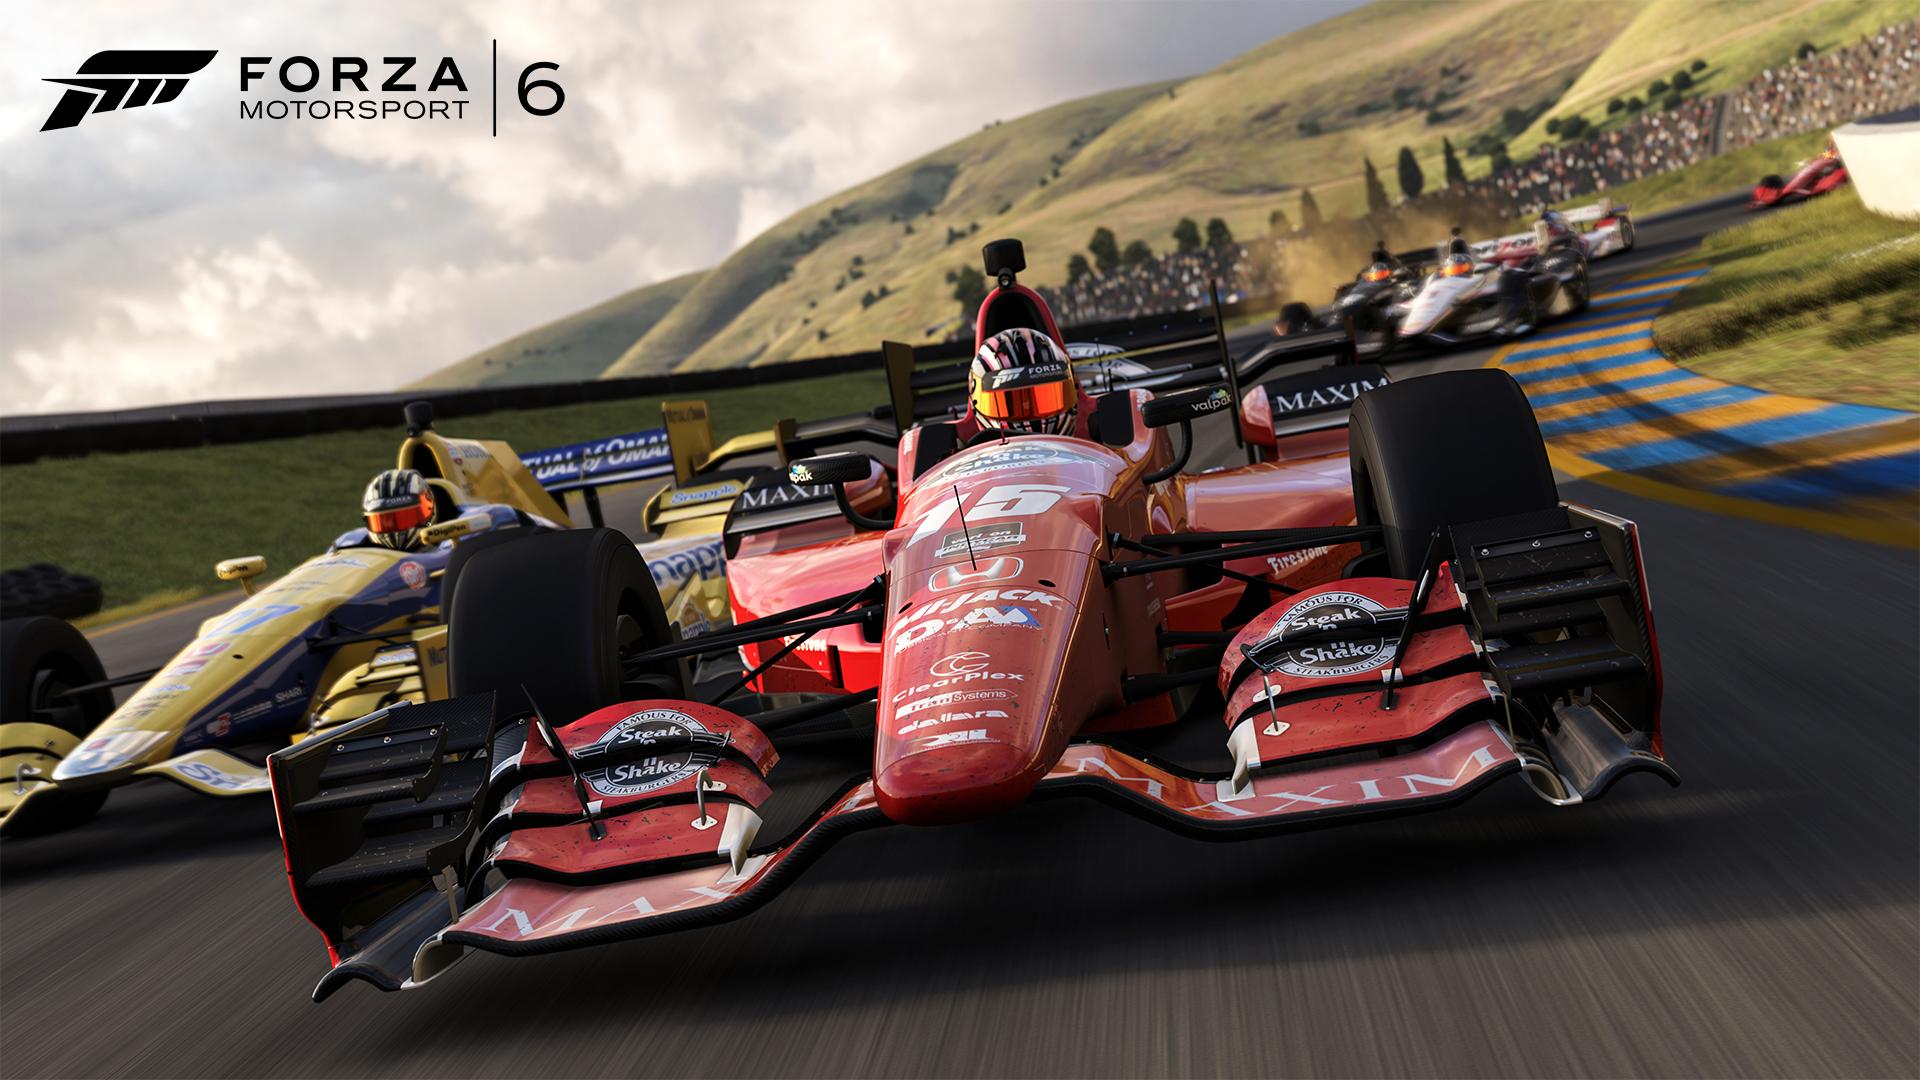 Forza Motorsport 6: végre egy nagyon király autós game, KONZOLRA